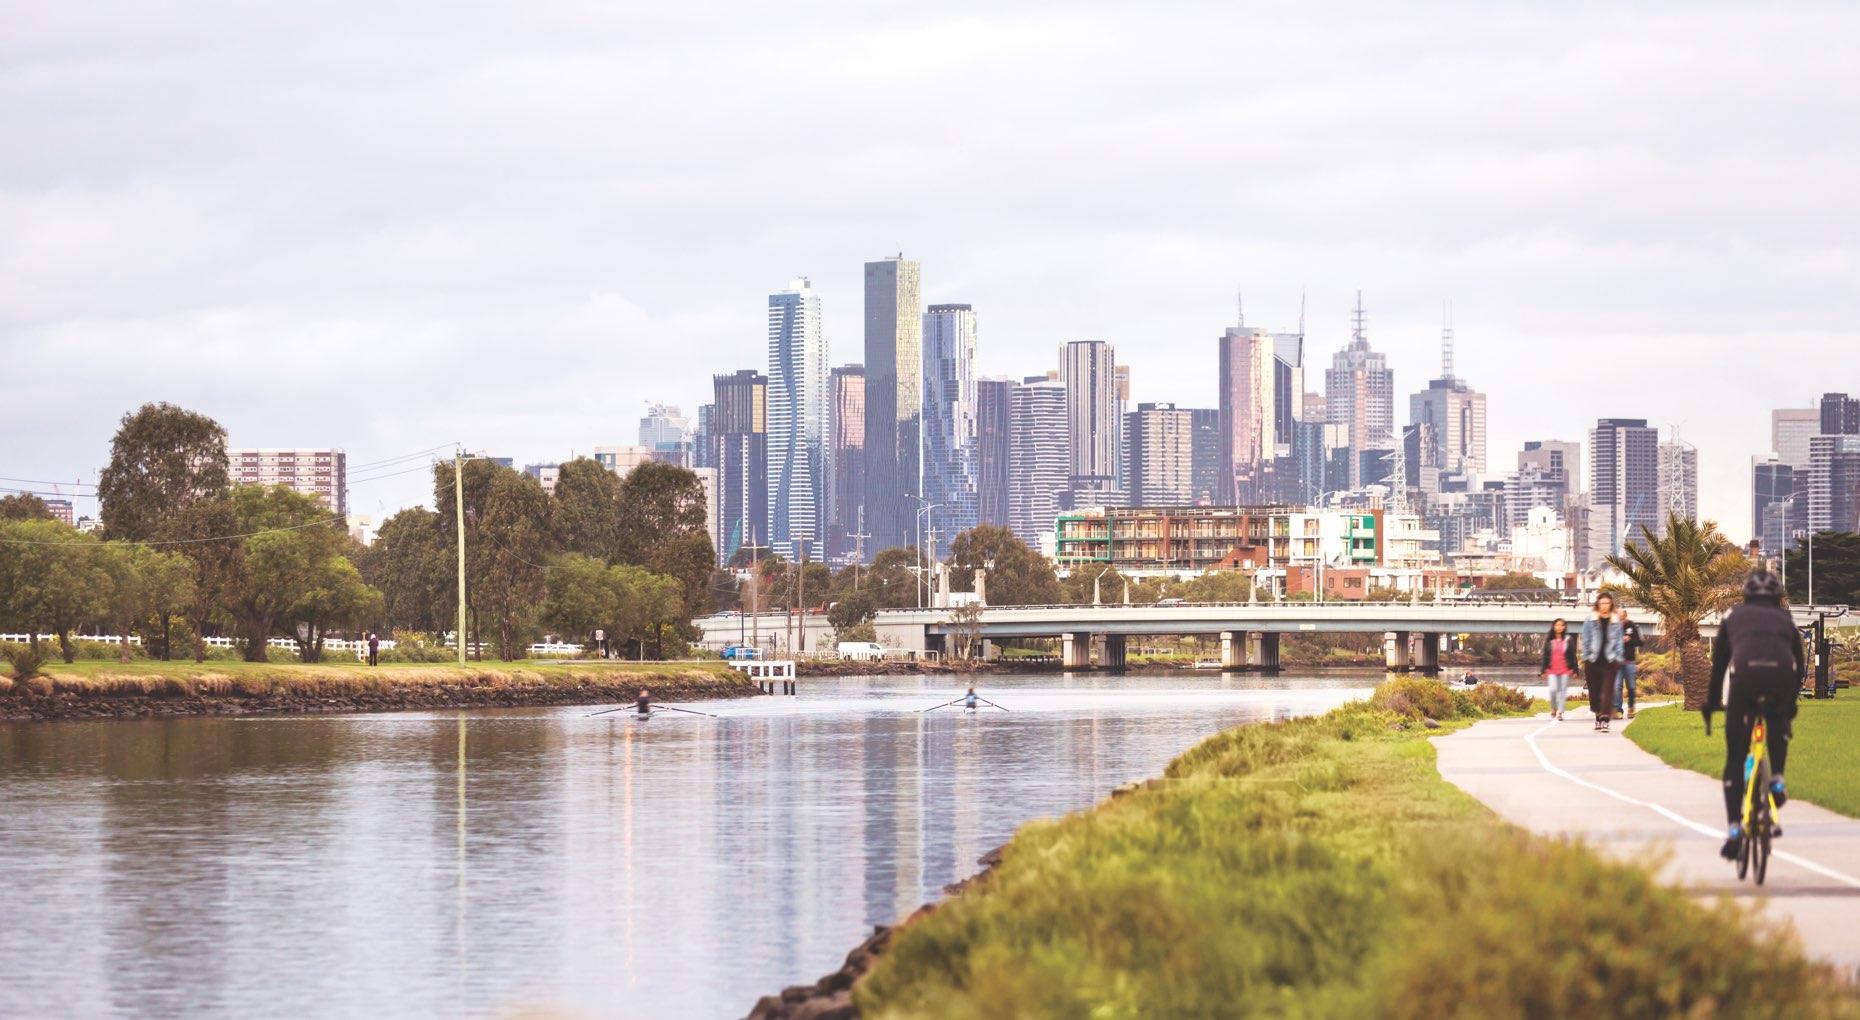 Liberty-One-Footscray-Maribyrnong-River-885-3